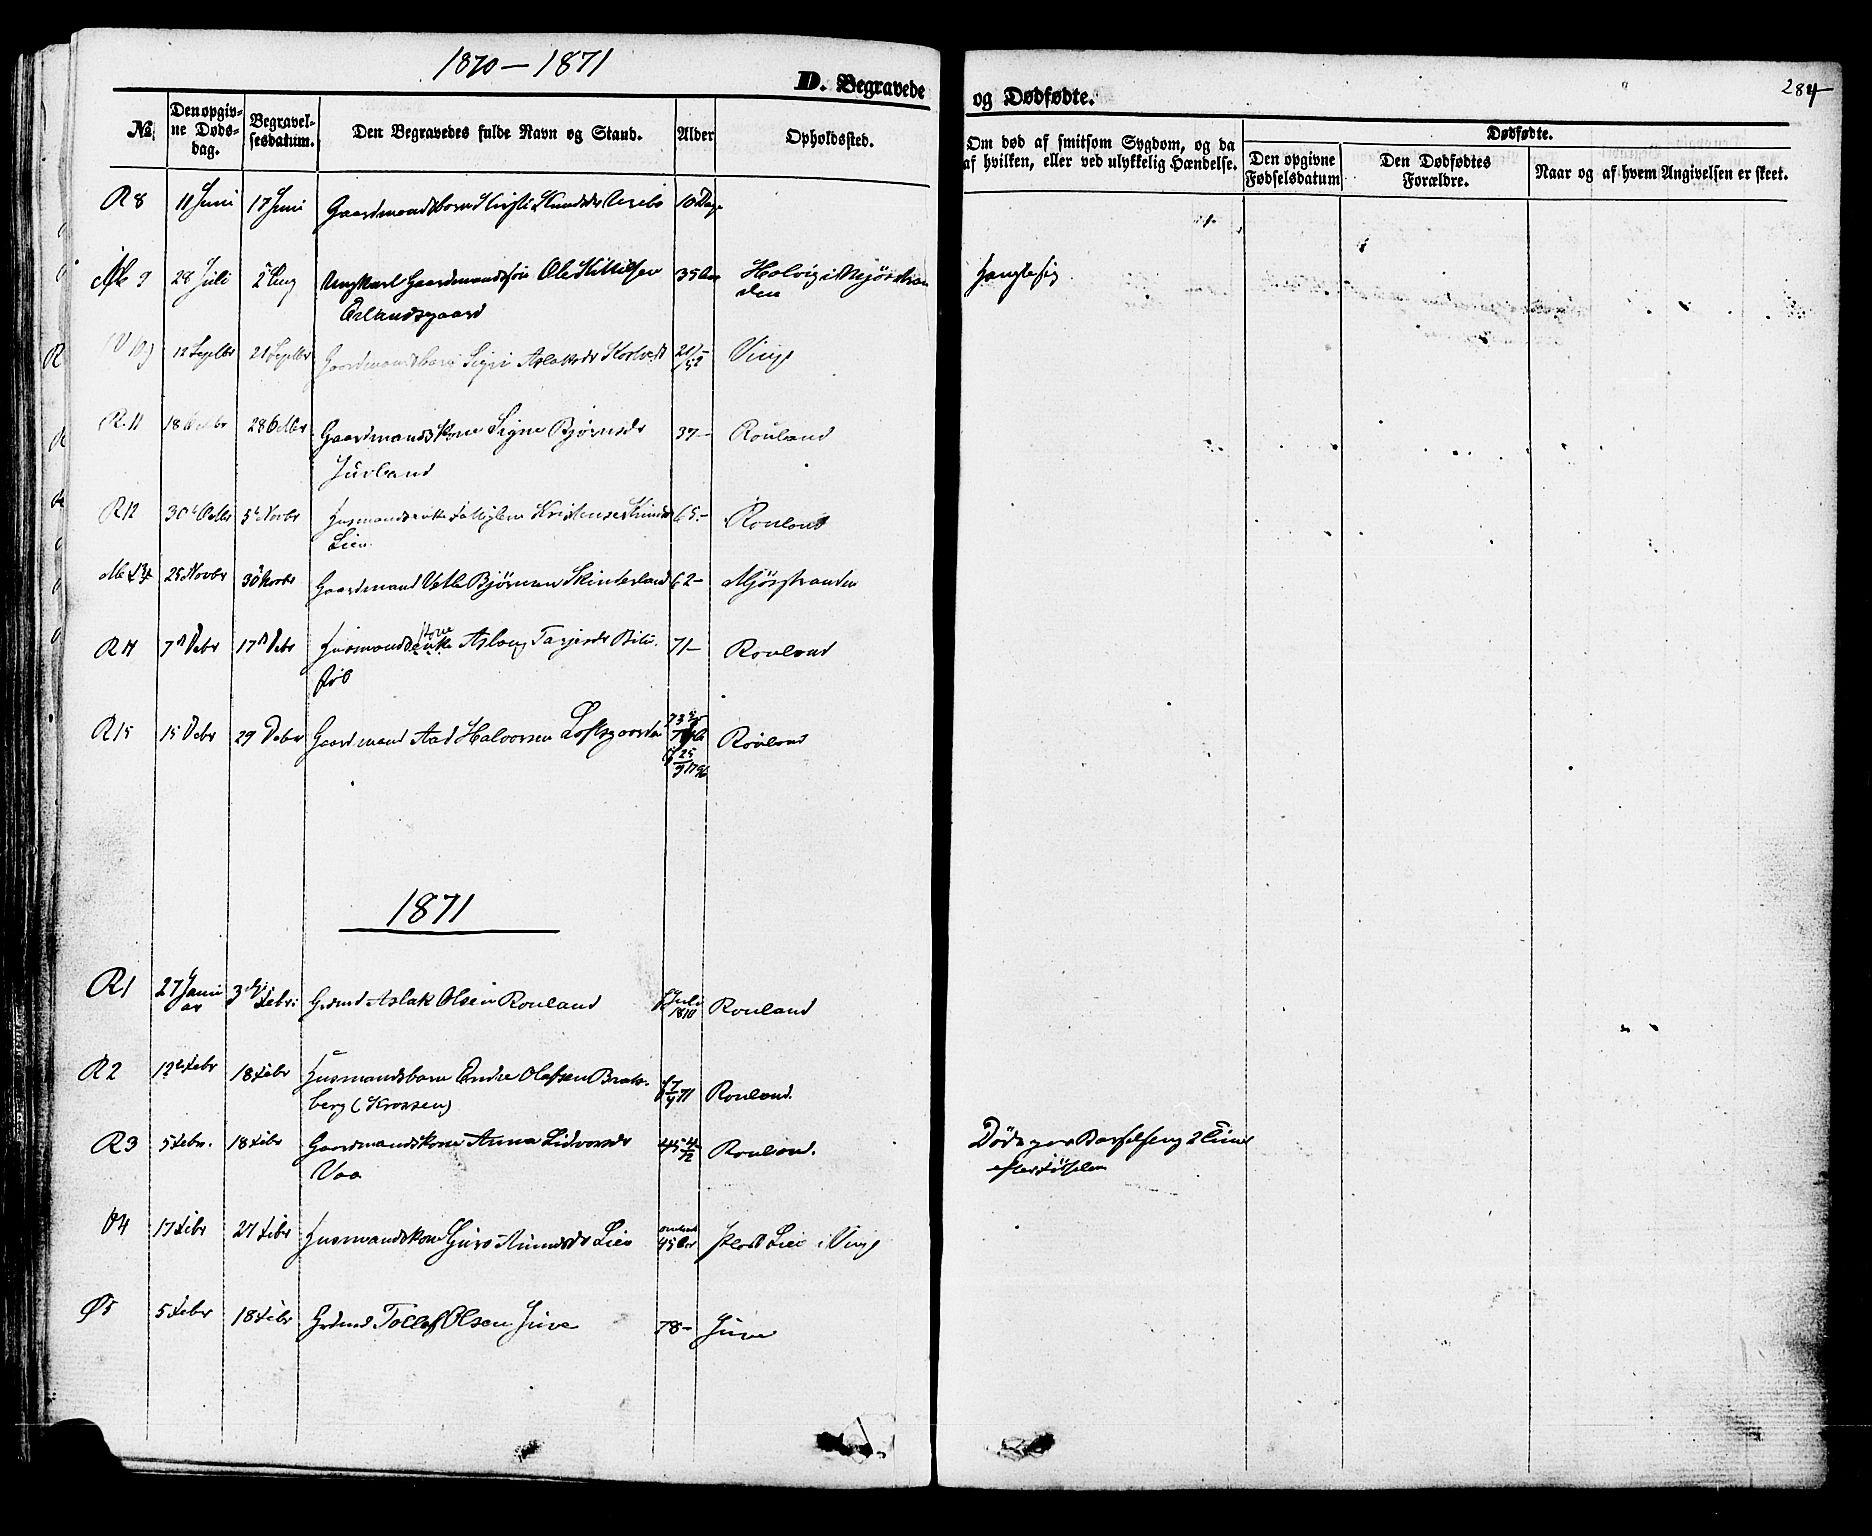 SAKO, Rauland kirkebøker, F/Fa/L0003: Ministerialbok nr. 3, 1859-1886, s. 284